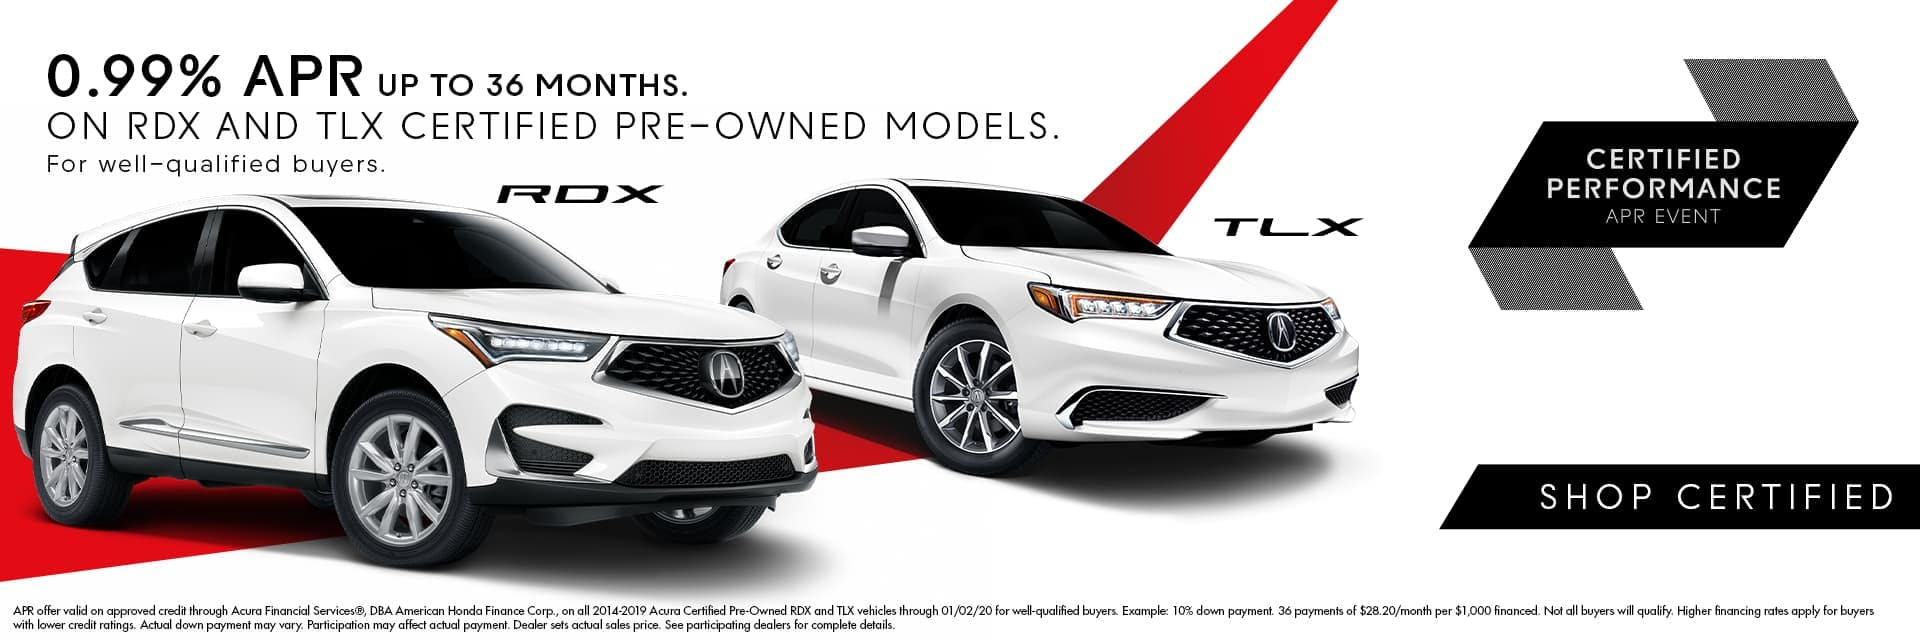 White Acura RDX and White Acura TLX